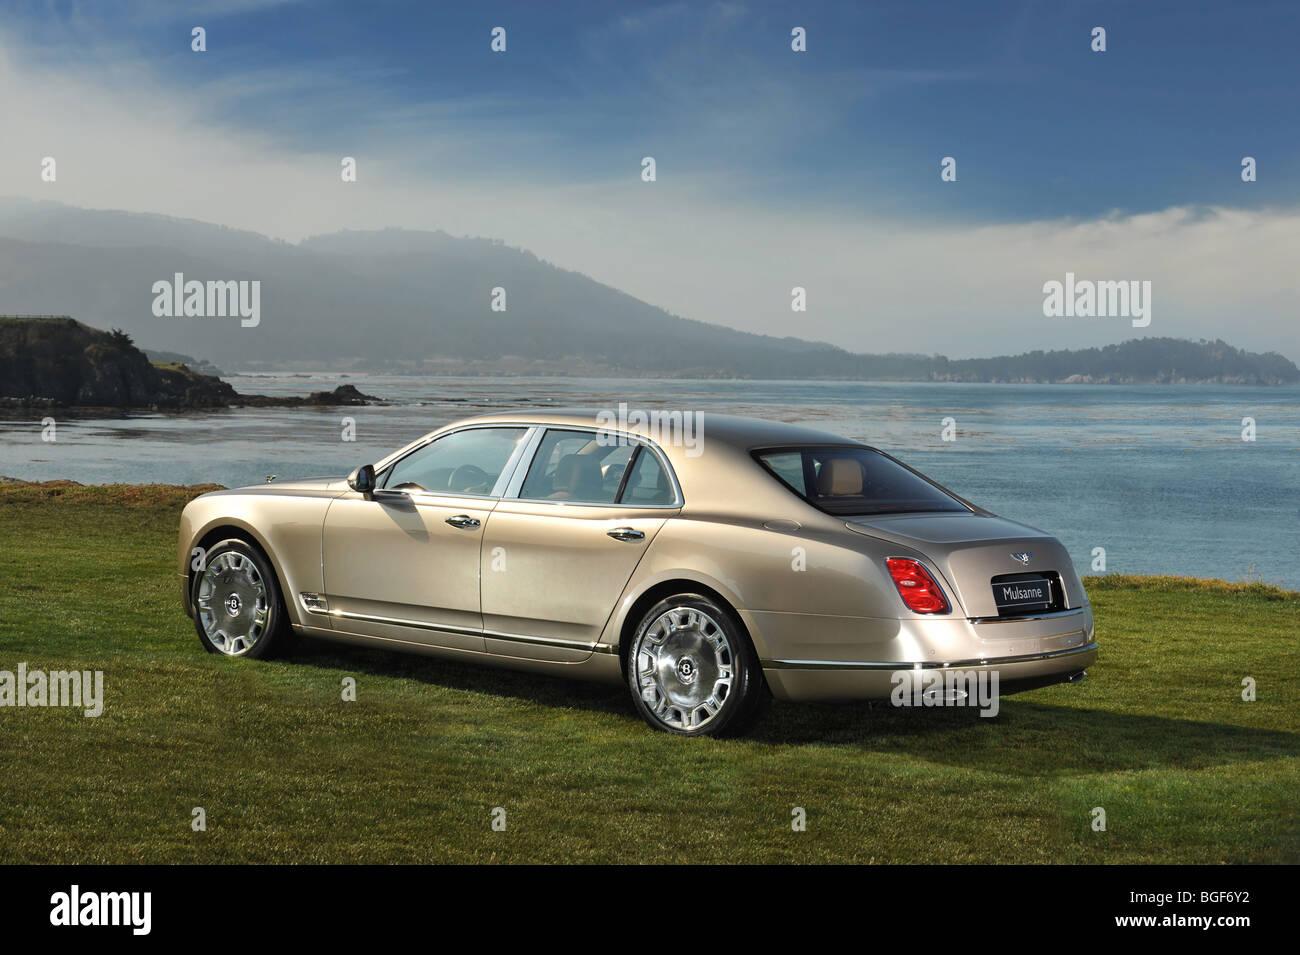 2009 Bentley Mulsanne bei Pebble Beach Concour de elegance Stockbild